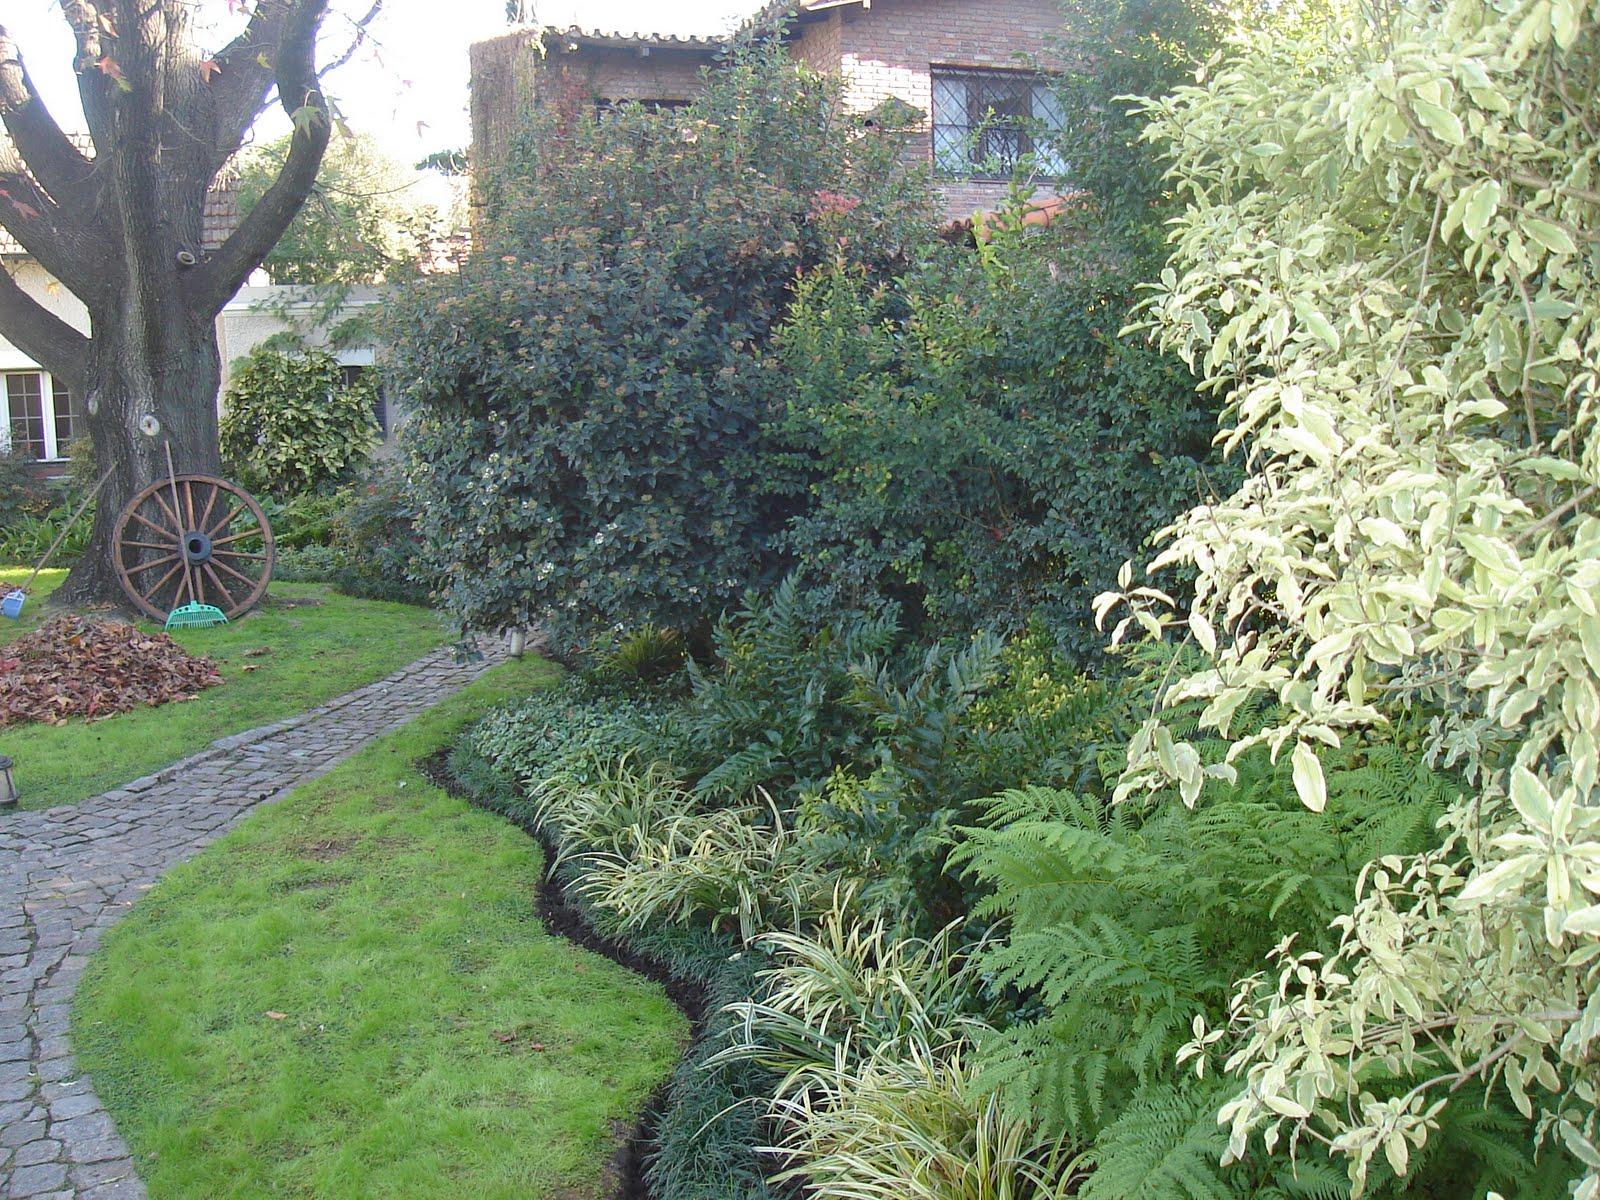 Estudio paisajismo jard n ingles reconstrucci n for Jardin en ingles